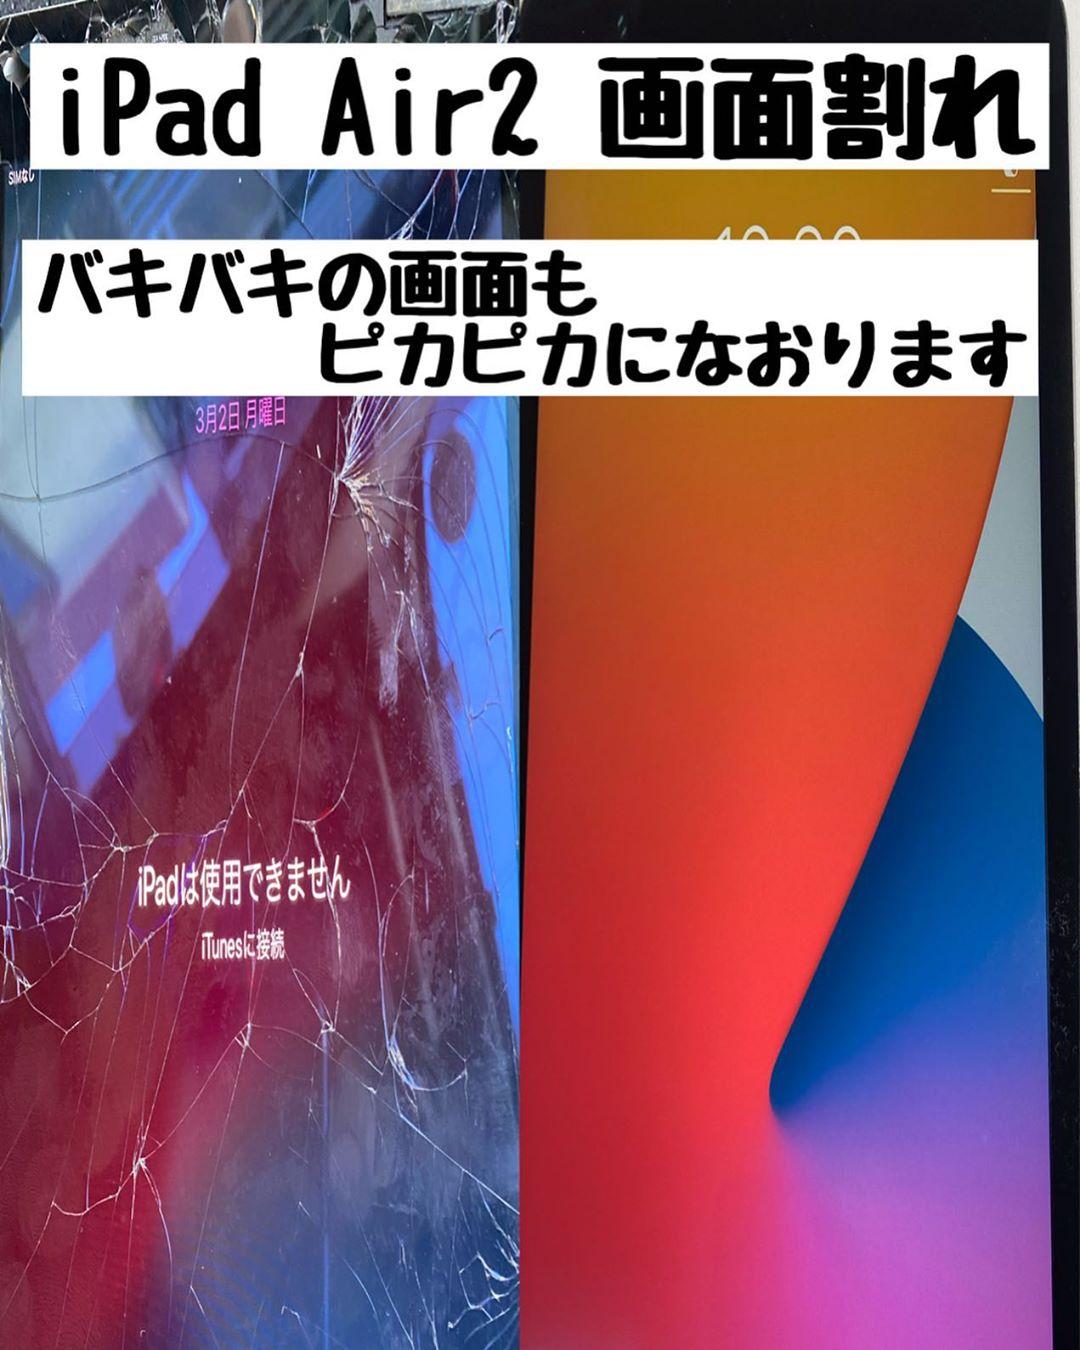 iPad修理 画面割れ 液晶パネル交換 エア2 江南市